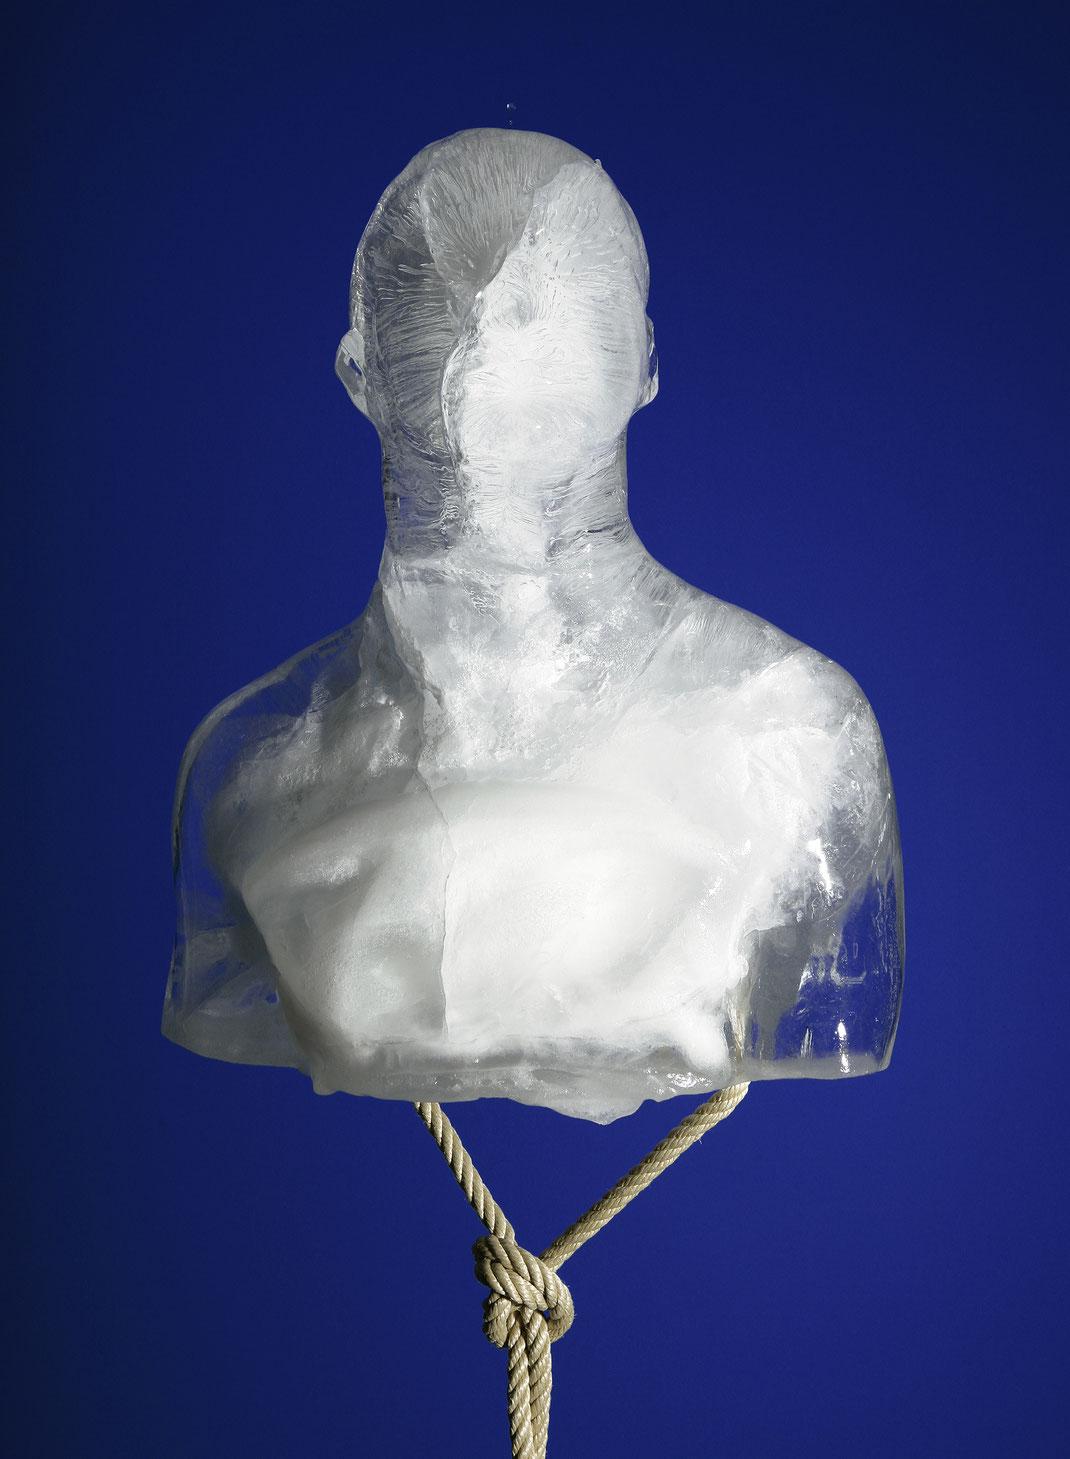 franticek-klossner-sculpture-the-human-body-in-contemporary-art-frozen-self-portrait